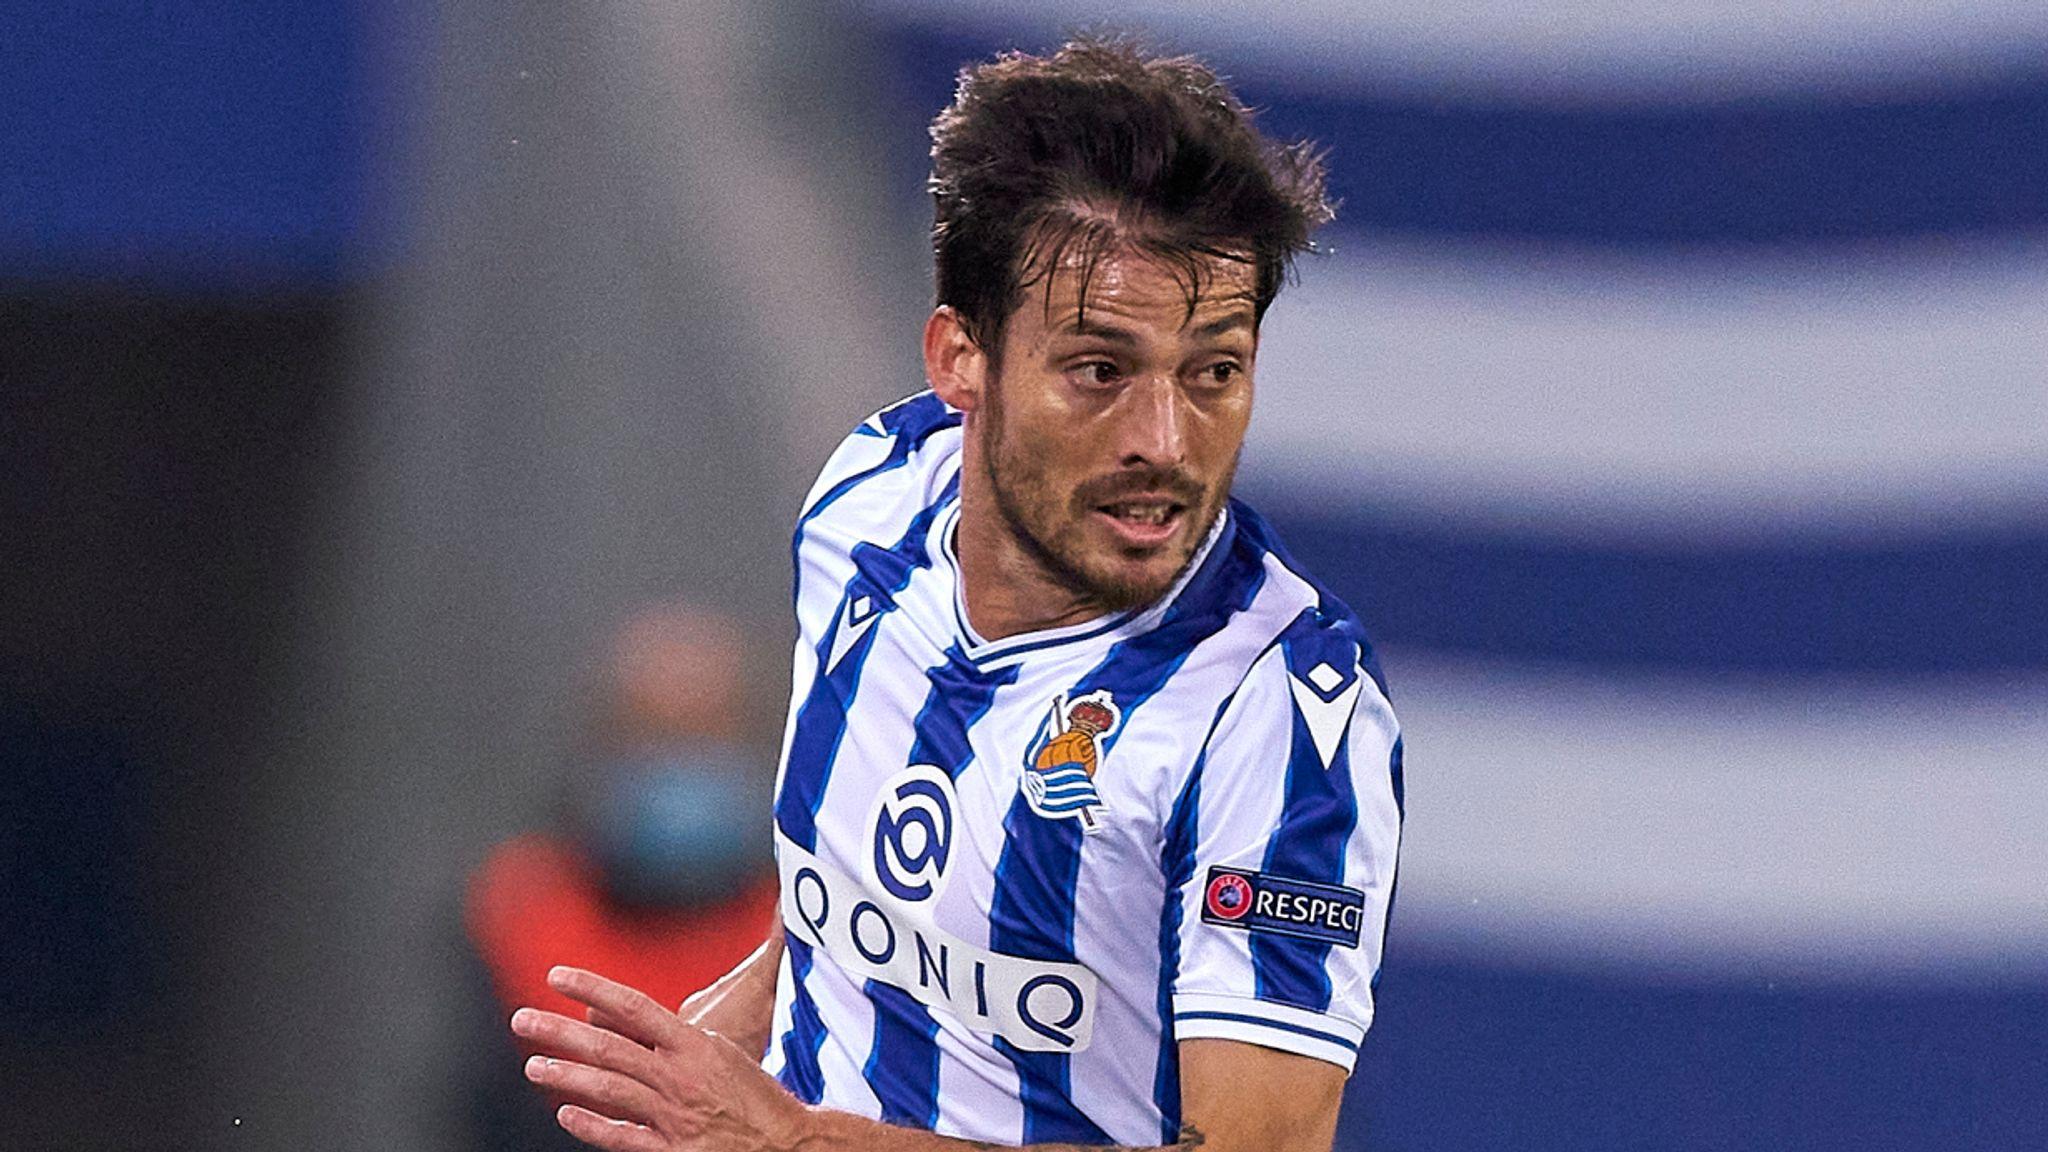 David Silva open minded on Real Sociedad future ahead of 2021/22